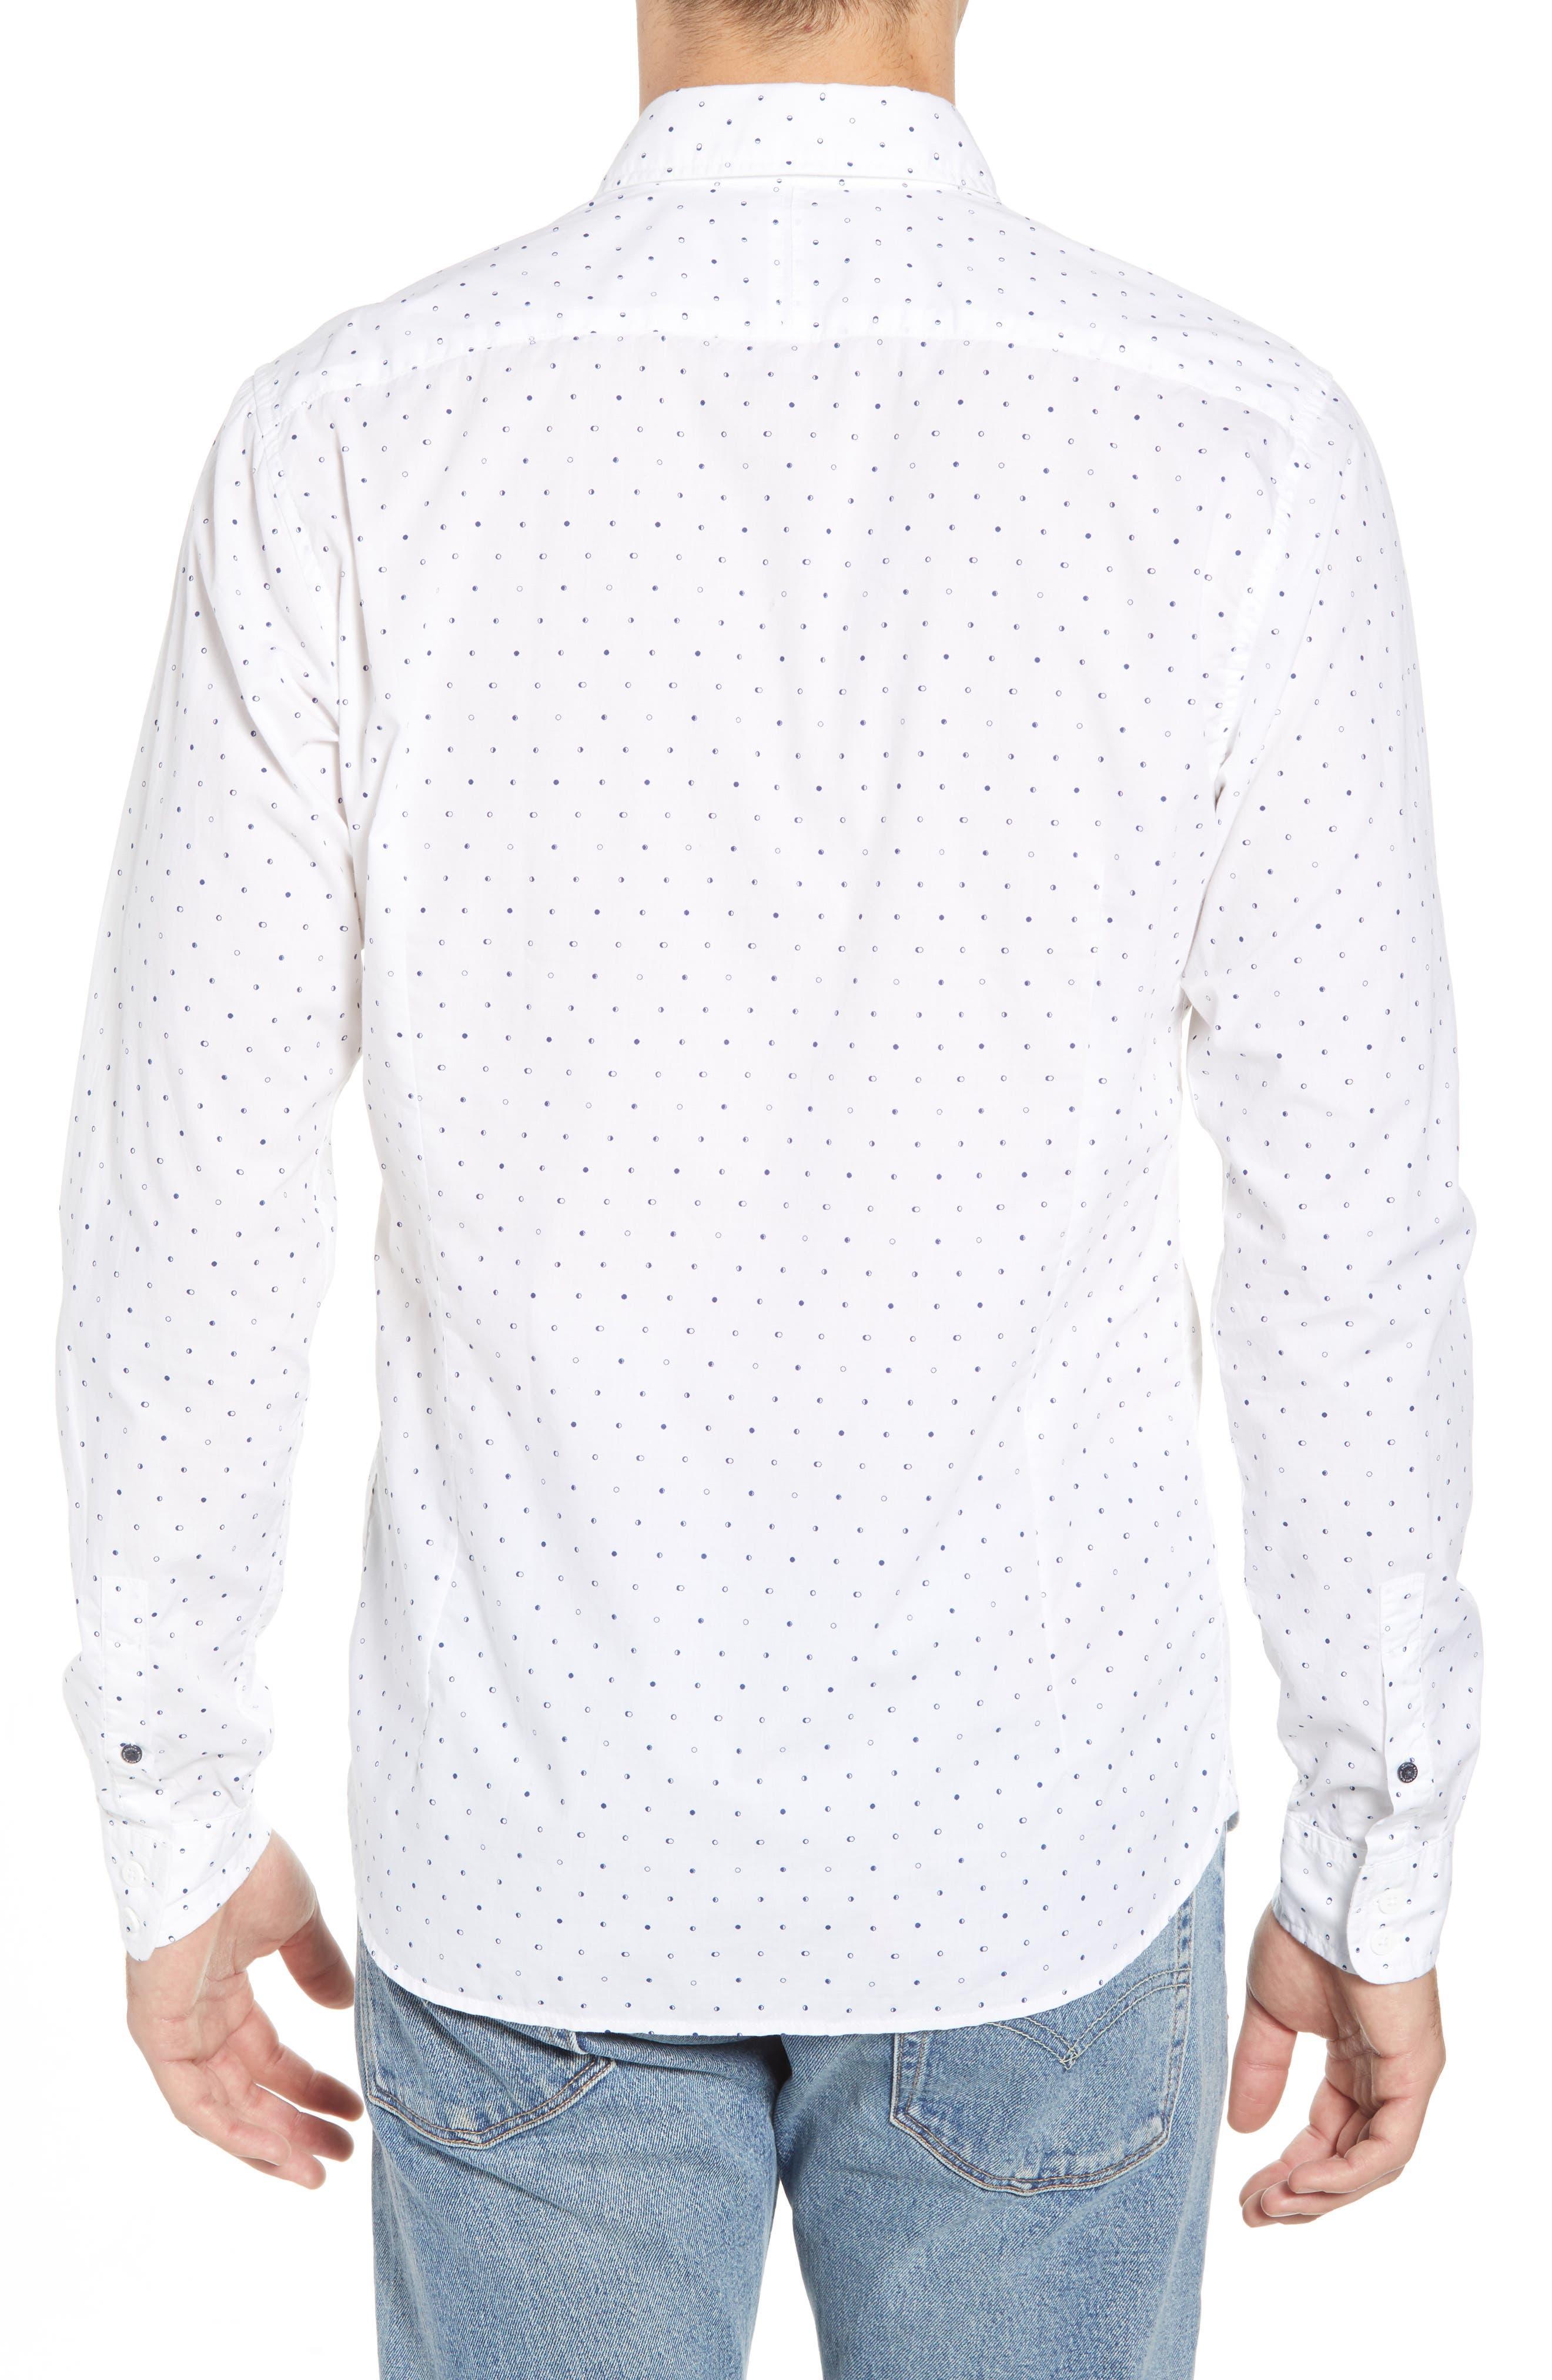 Amsterdams Blauw Simple Light Print Sport Shirt,                             Alternate thumbnail 2, color,                             110